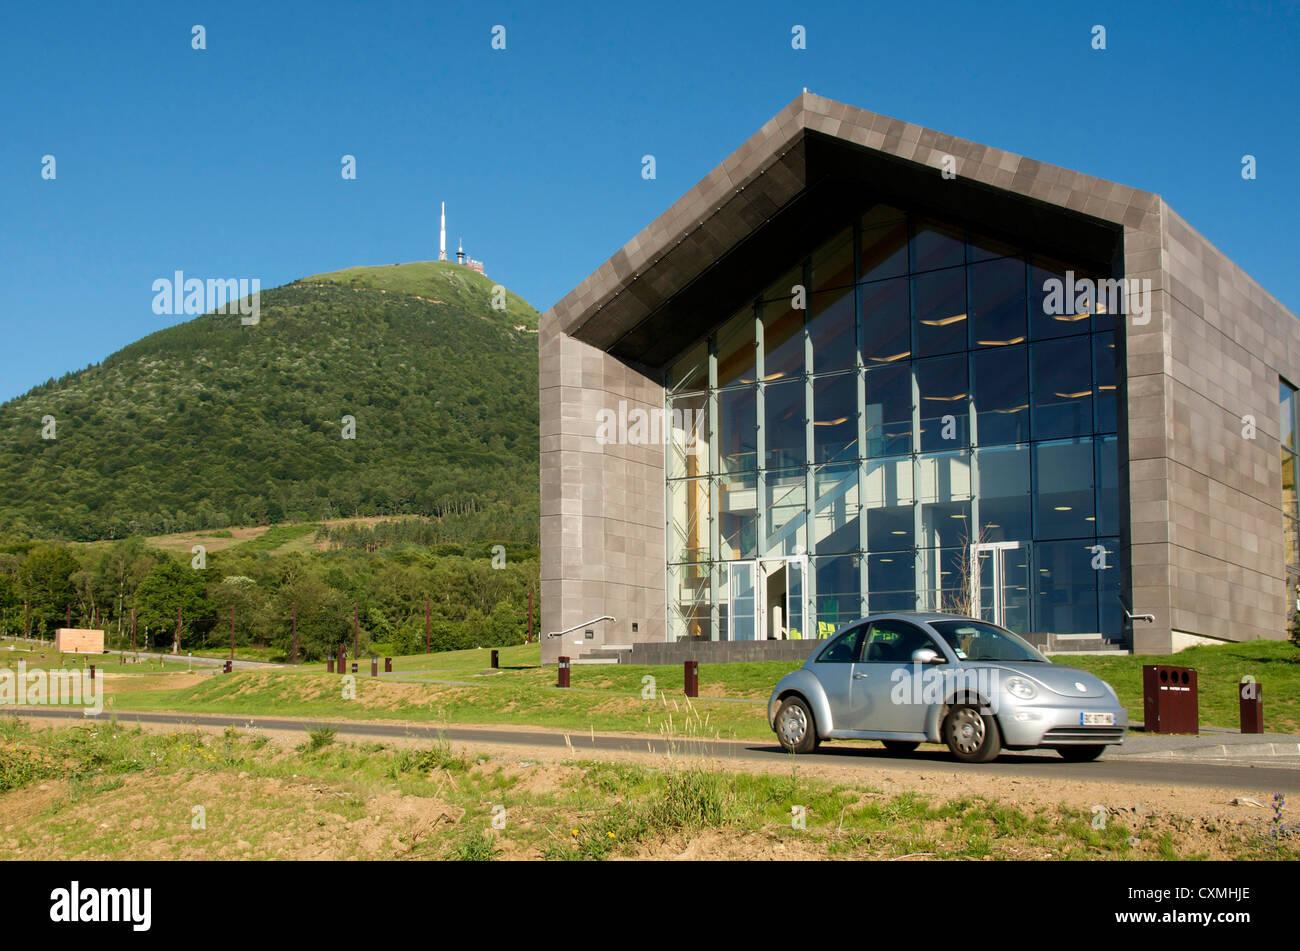 Station of Panoramique des Domes, tourist train of Puy de Dome. Park Regional of Auvergne volcanoes. France - Stock Image